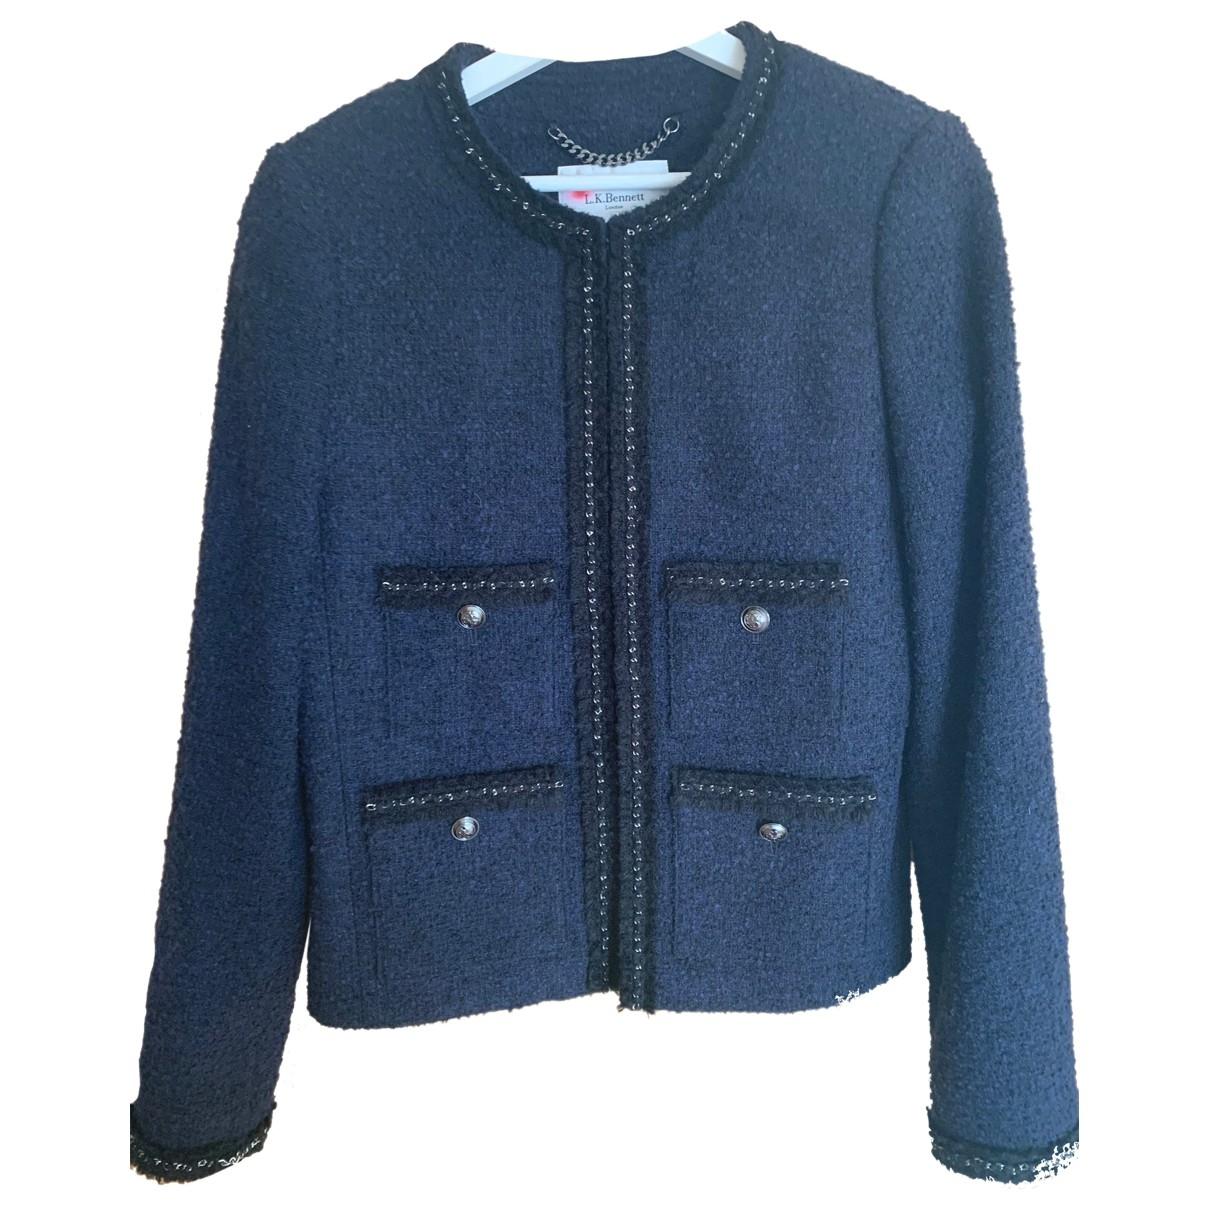 Lk Bennett - Veste   pour femme en tweed - bleu